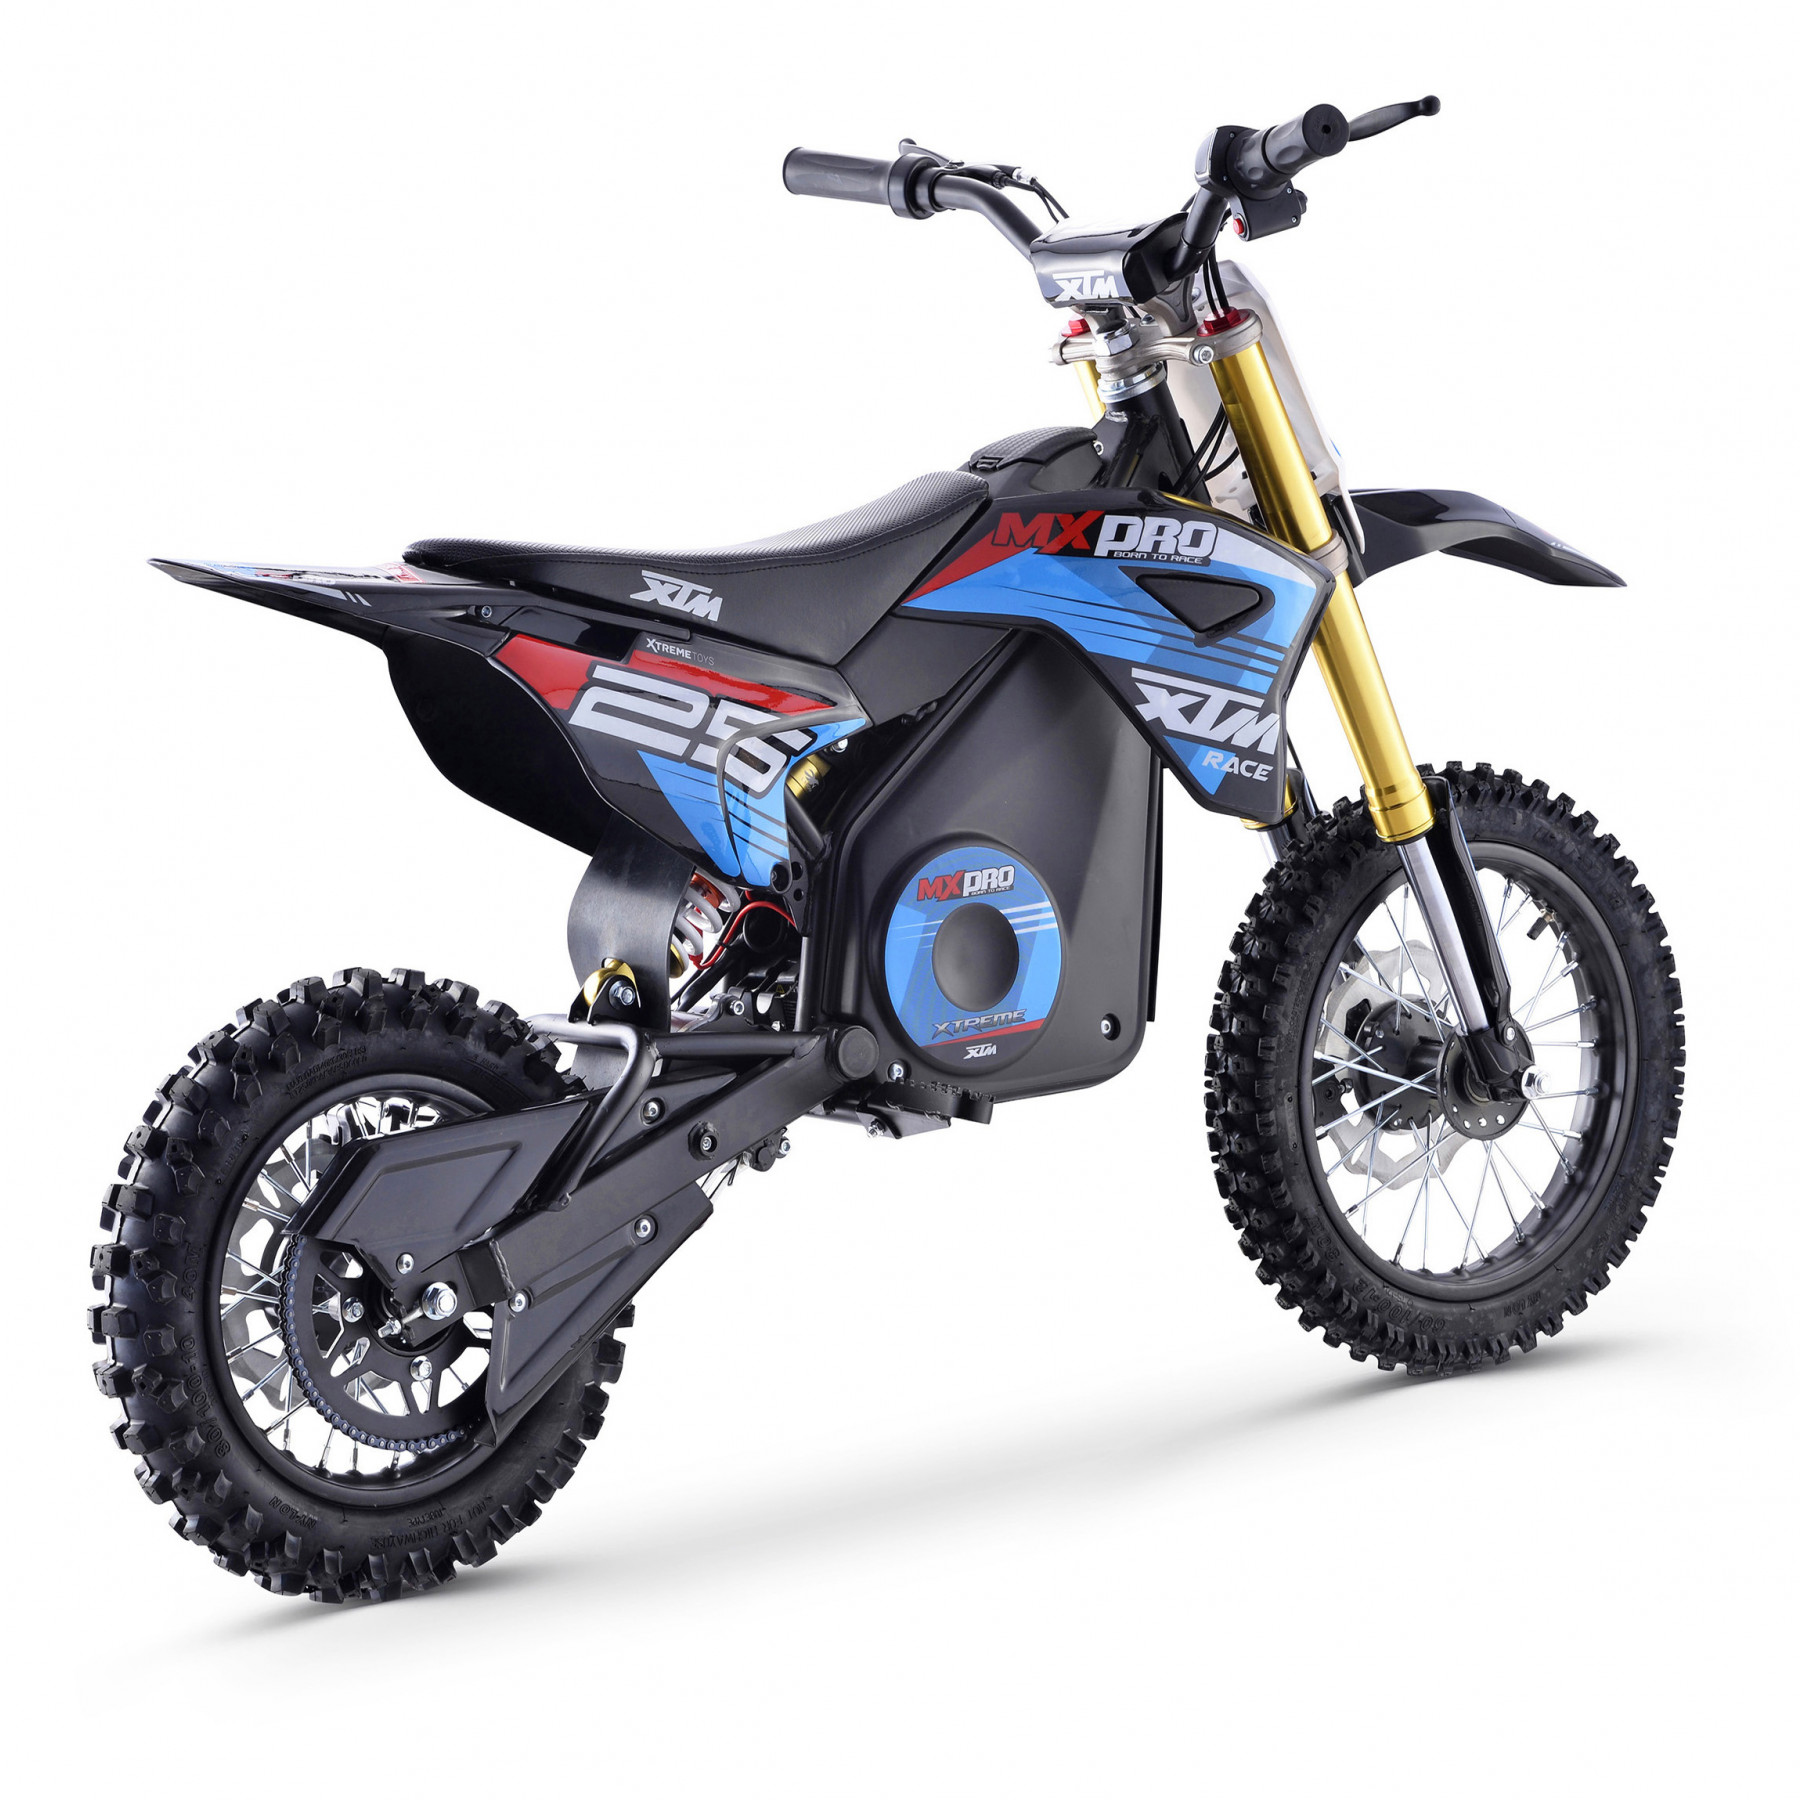 XTM MX-PRO 48V 1300W BIG WHEEL LITHIUM DIRT BIKE BLUE